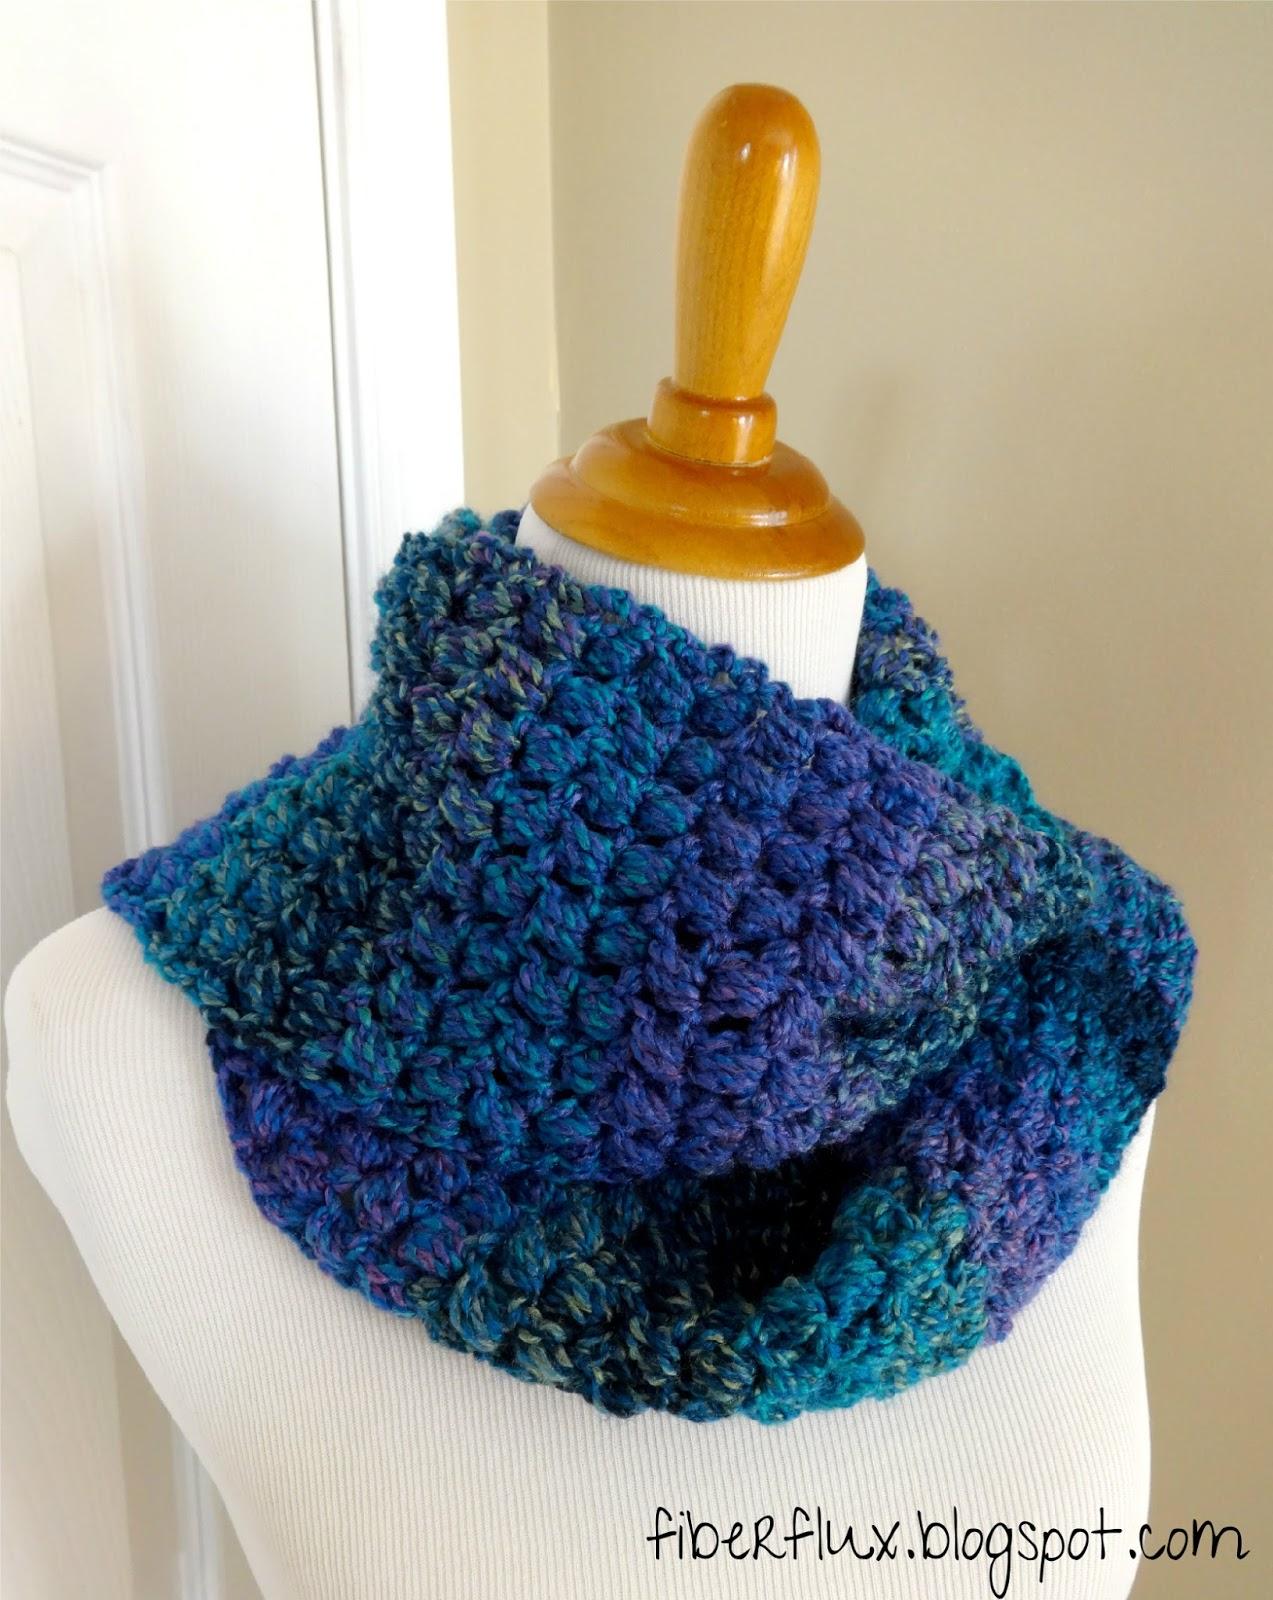 Fiber Flux: Free Crochet Pattern...Tweedy Puff Stitch Scarf!